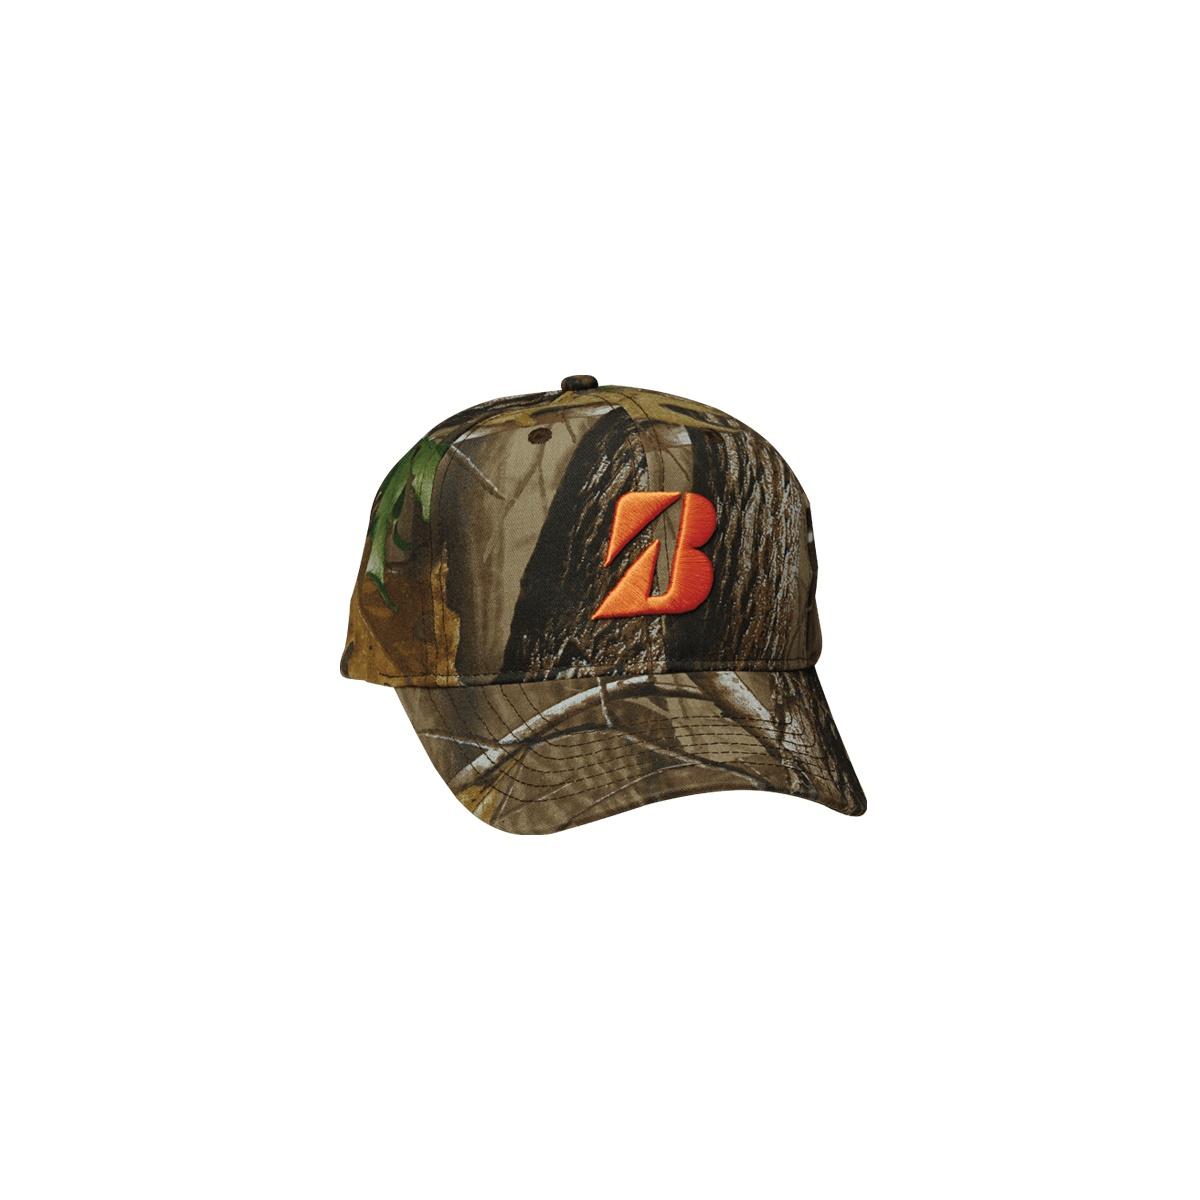 7946385be1010 Bridgestone Golf RealTree Adjustable Hat with Orange Logo